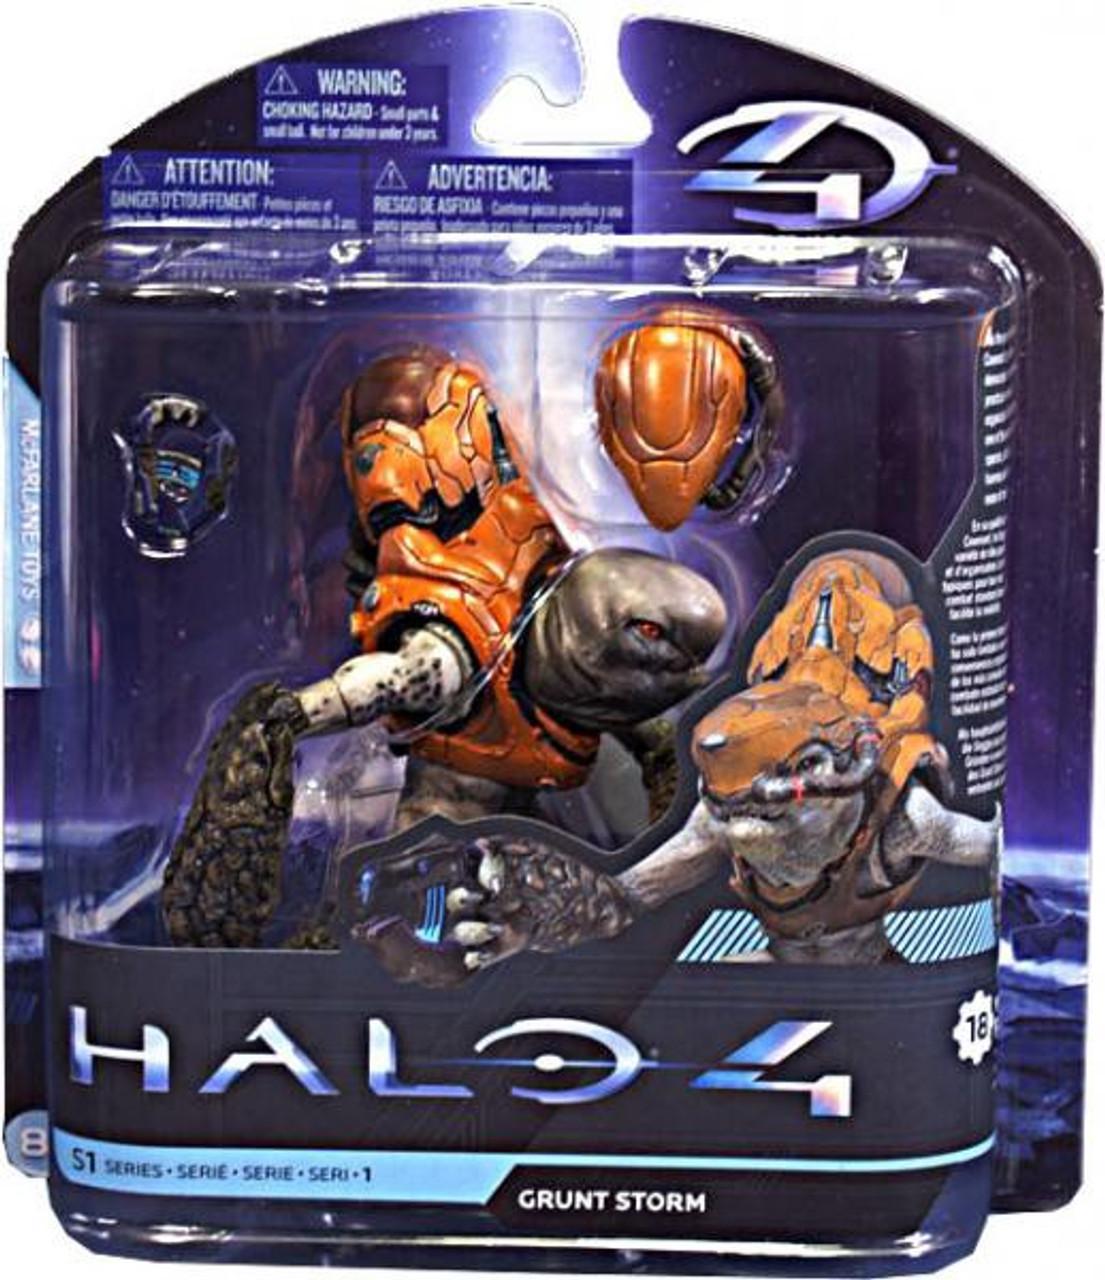 McFarlane Toys Halo 4 Series 1 Grunt Storm Action Figure